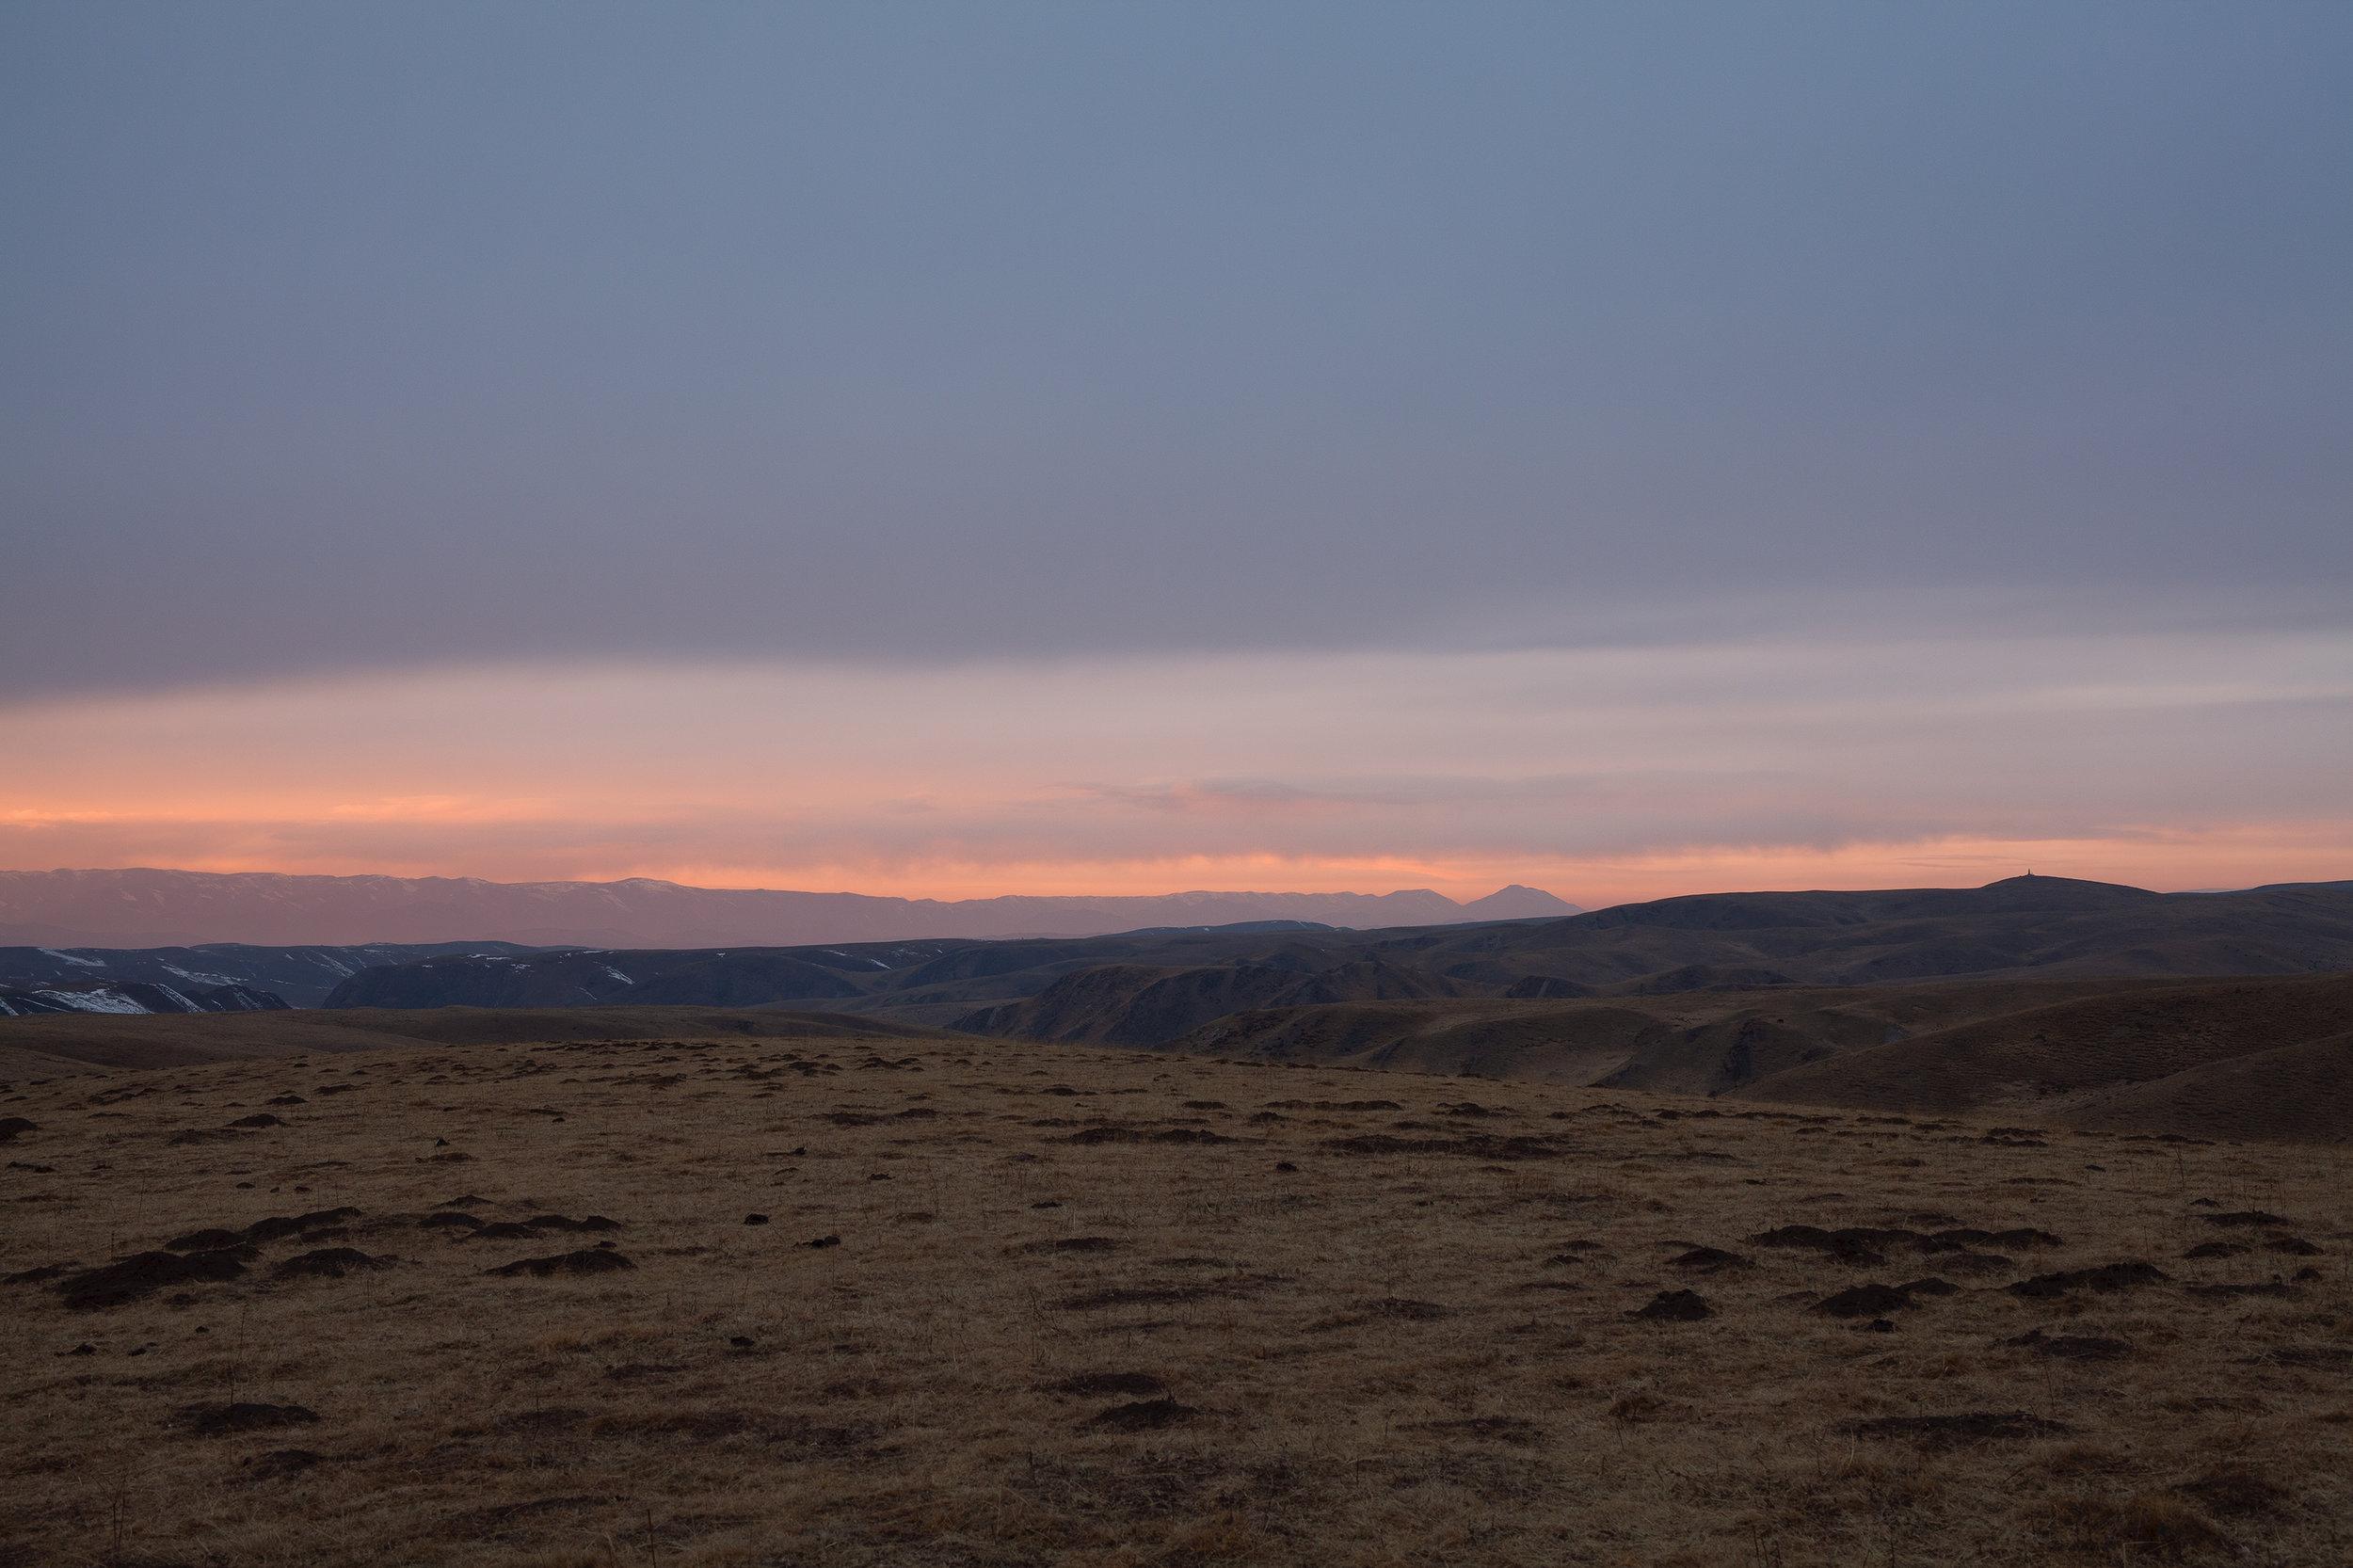 OE_norla-landscape-hdr.jpg